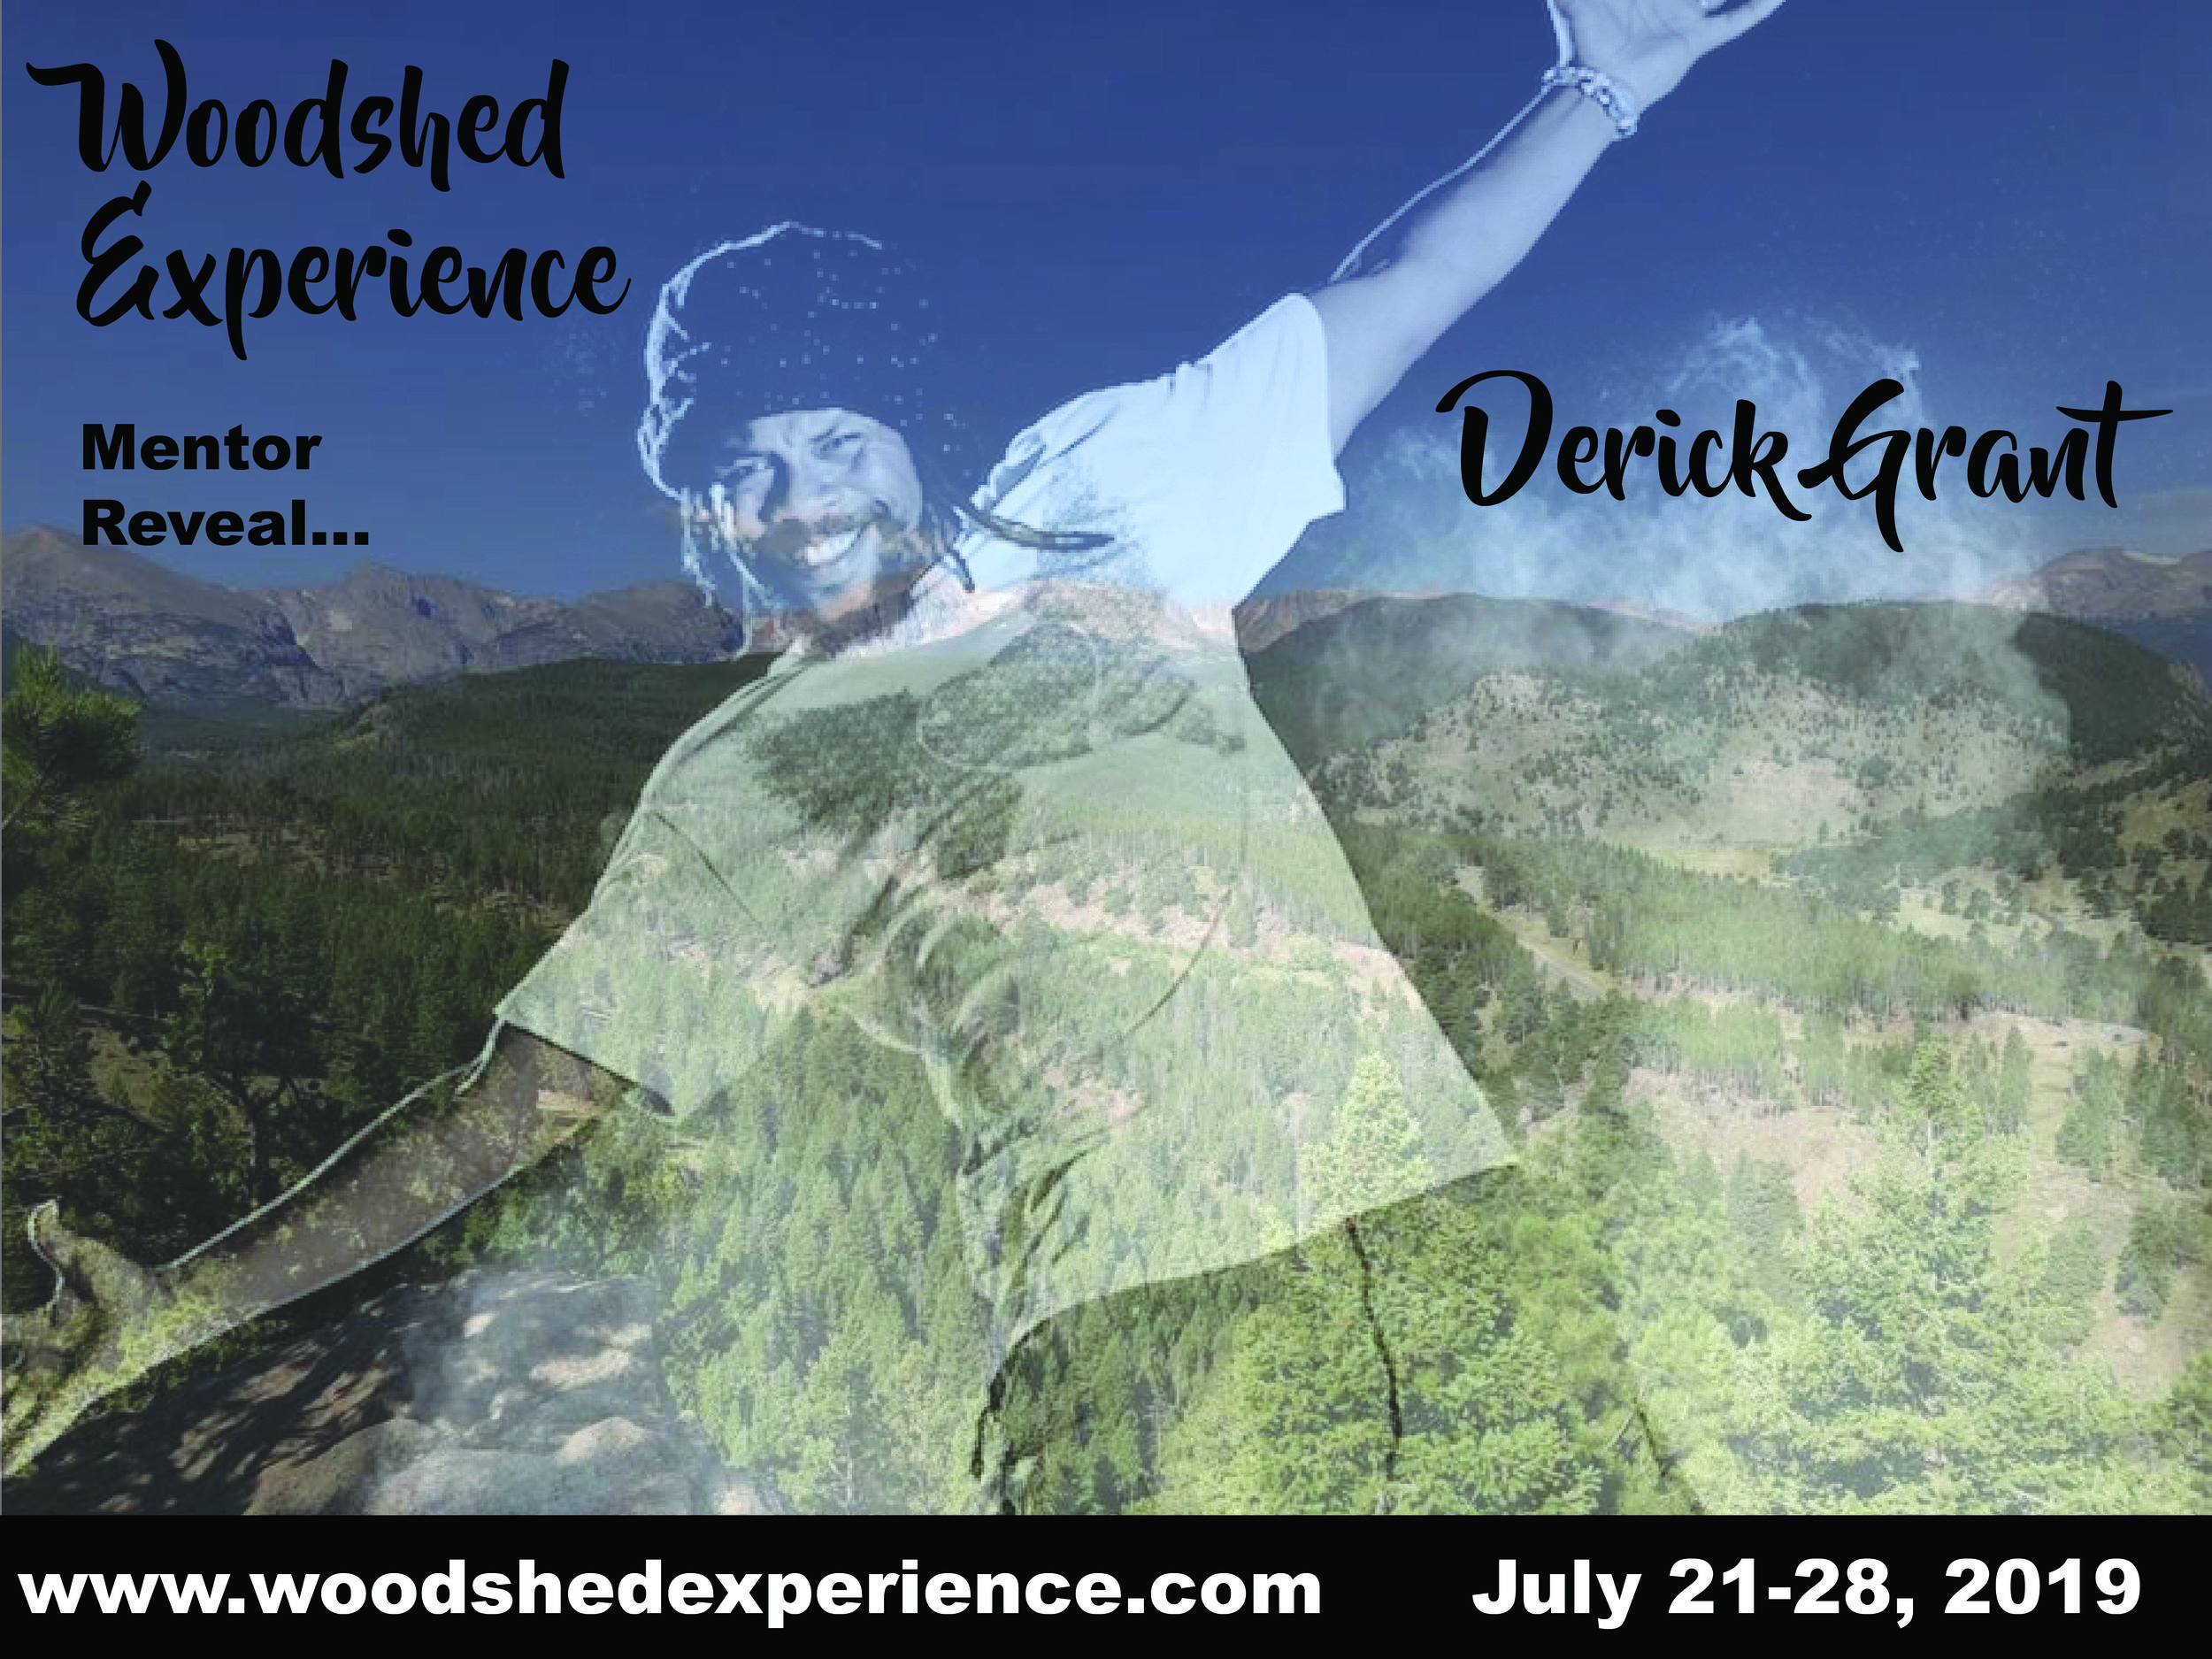 Woodshed mentor reveal Derick plain.jpg